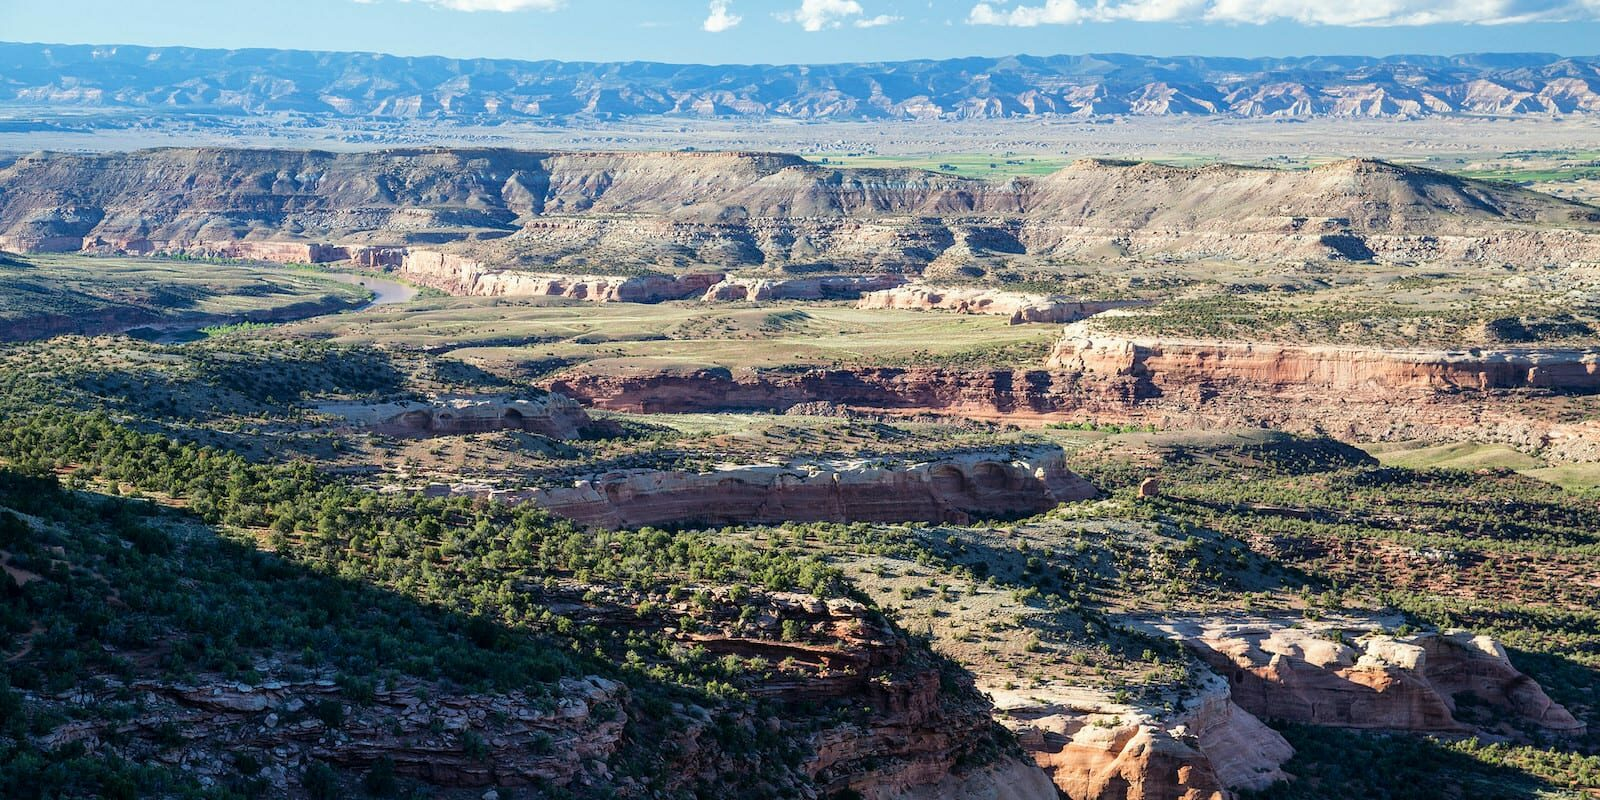 McInnis Canyon National Conservation Area Colorado